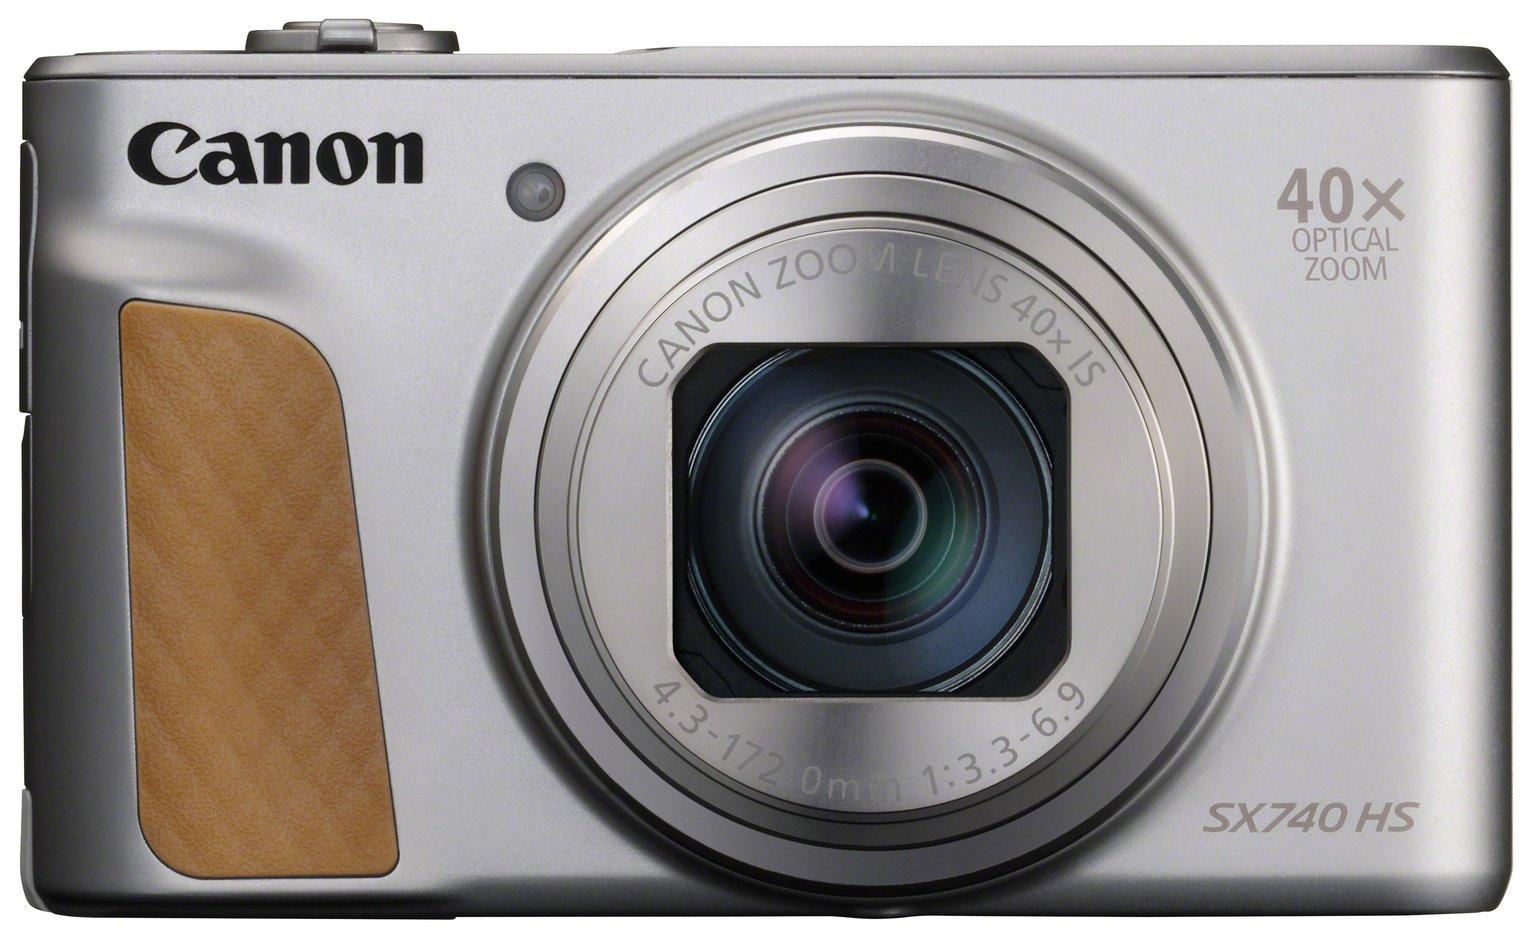 Canon PowerShot SX740 HS 20.3MP 40x Zoom Camera - Silver